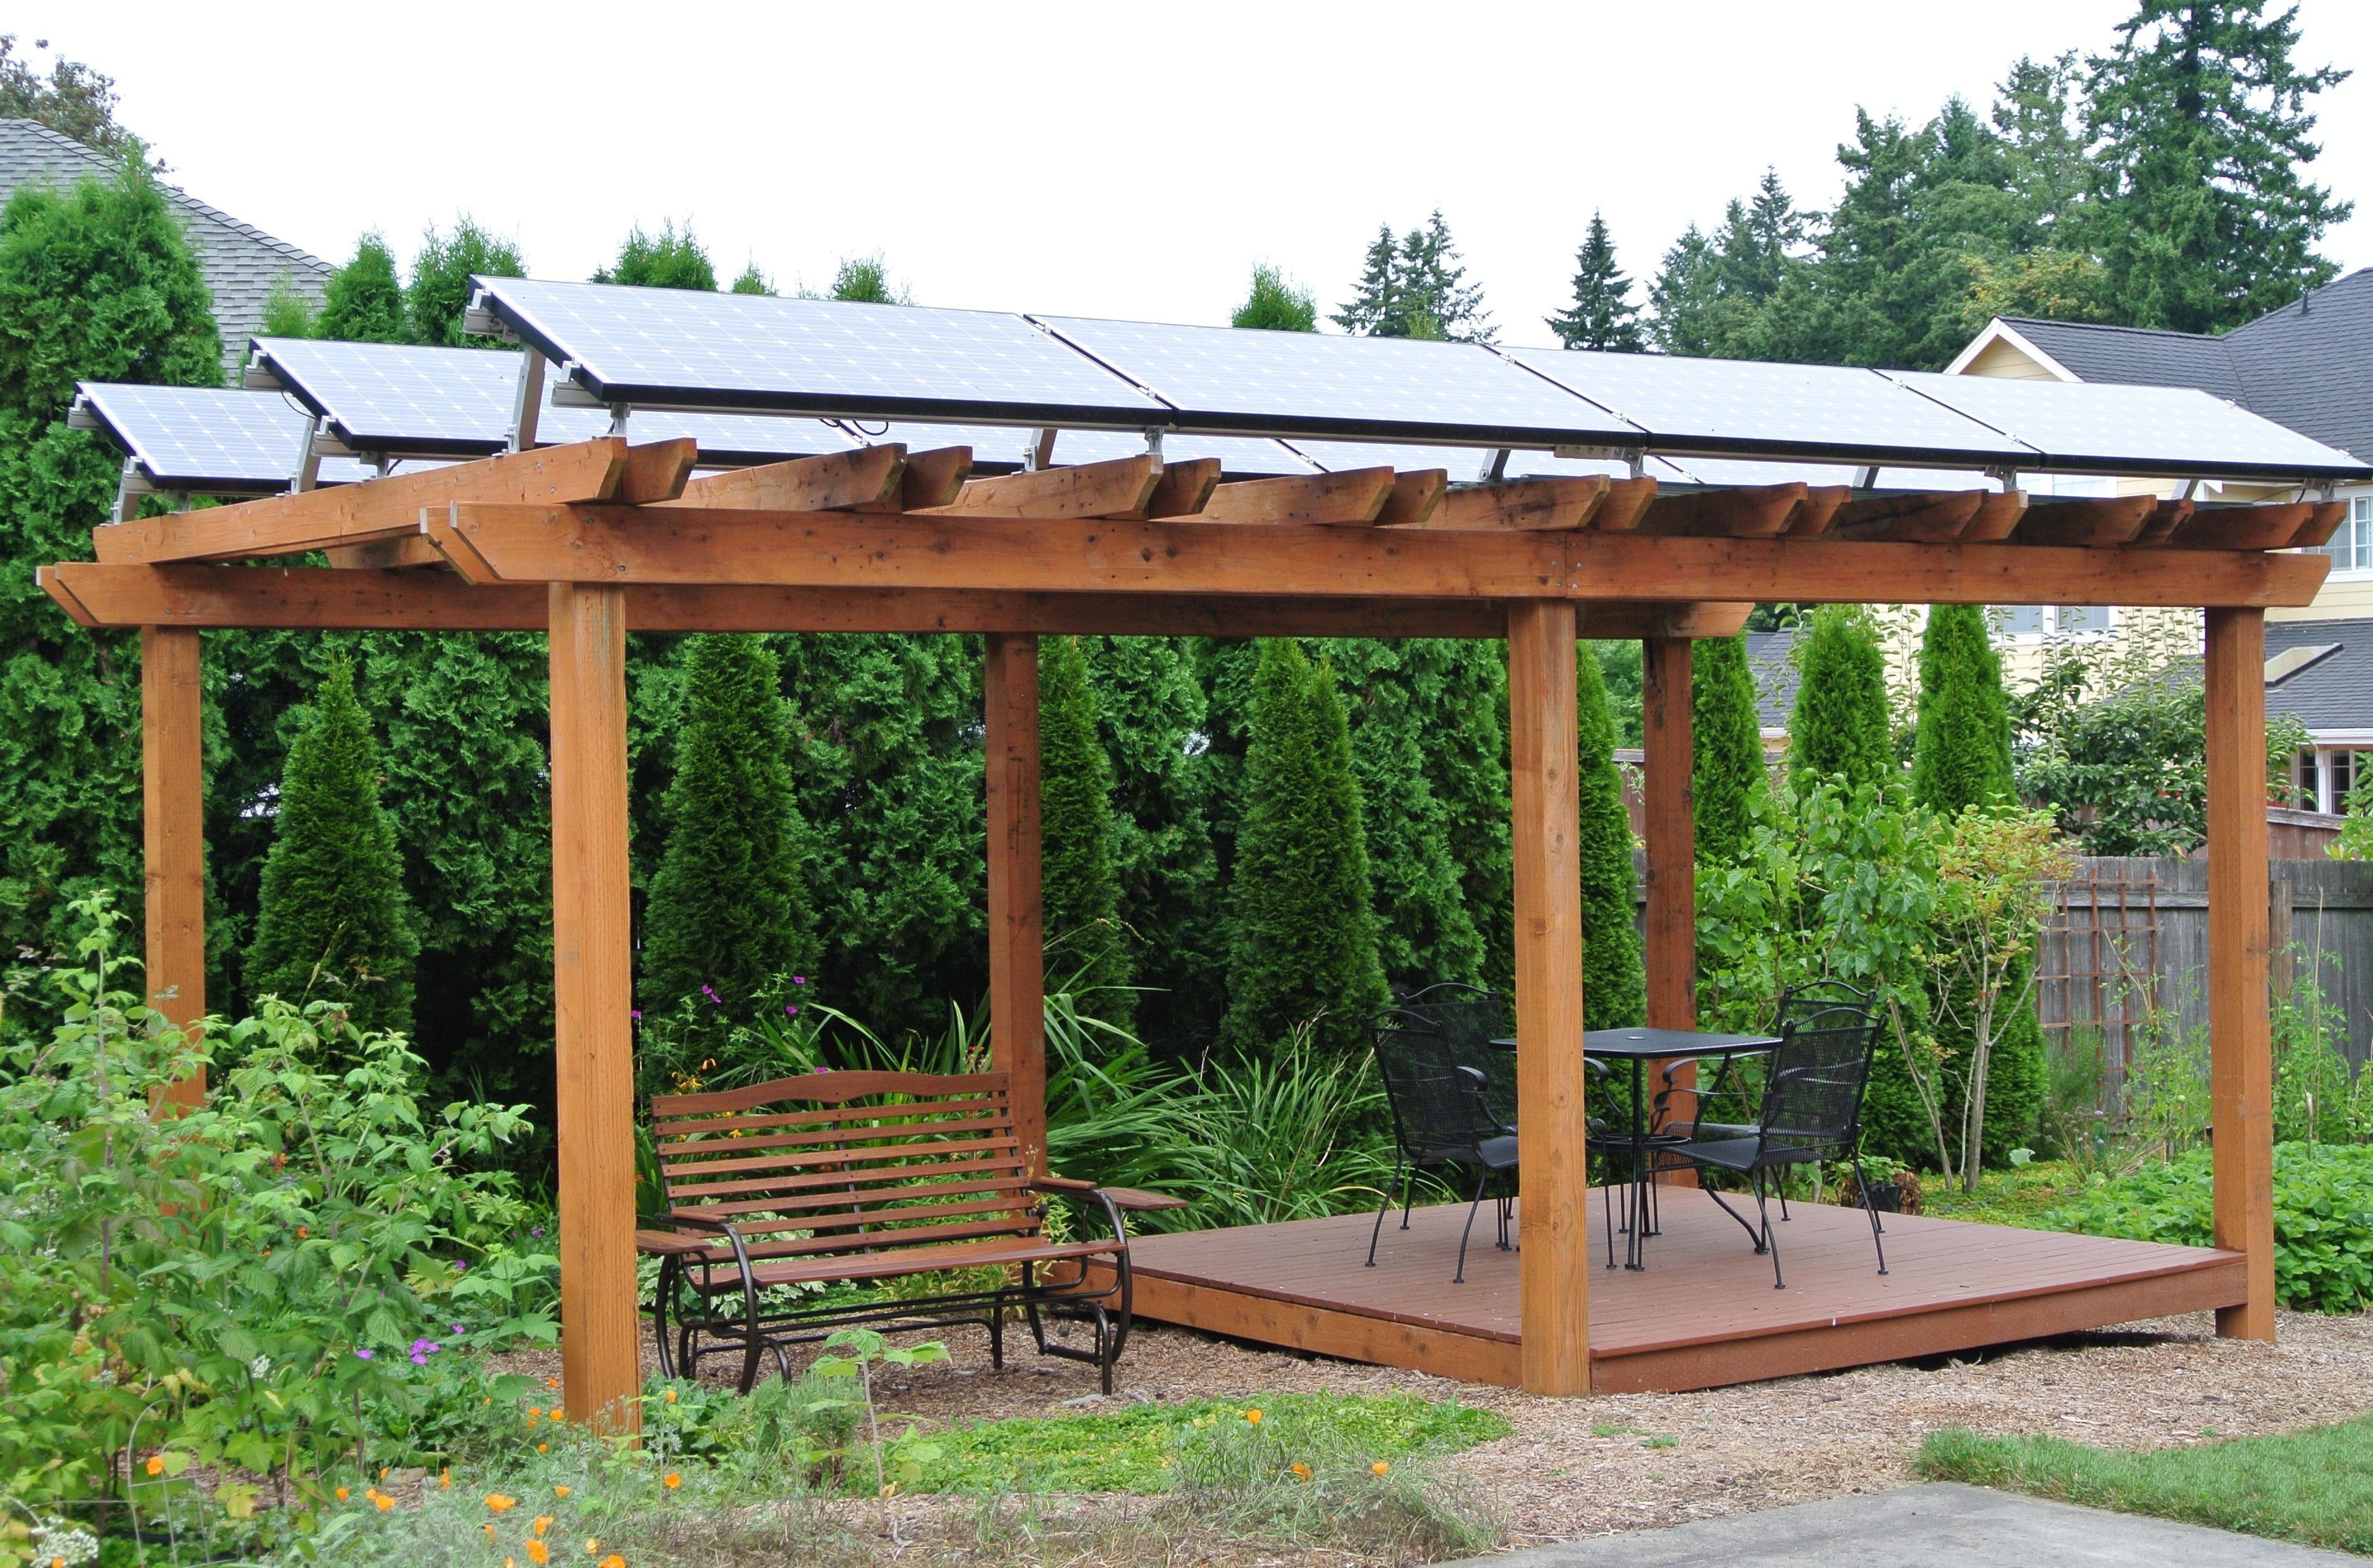 Solar panel's on a garden pergola. | On the farm ...